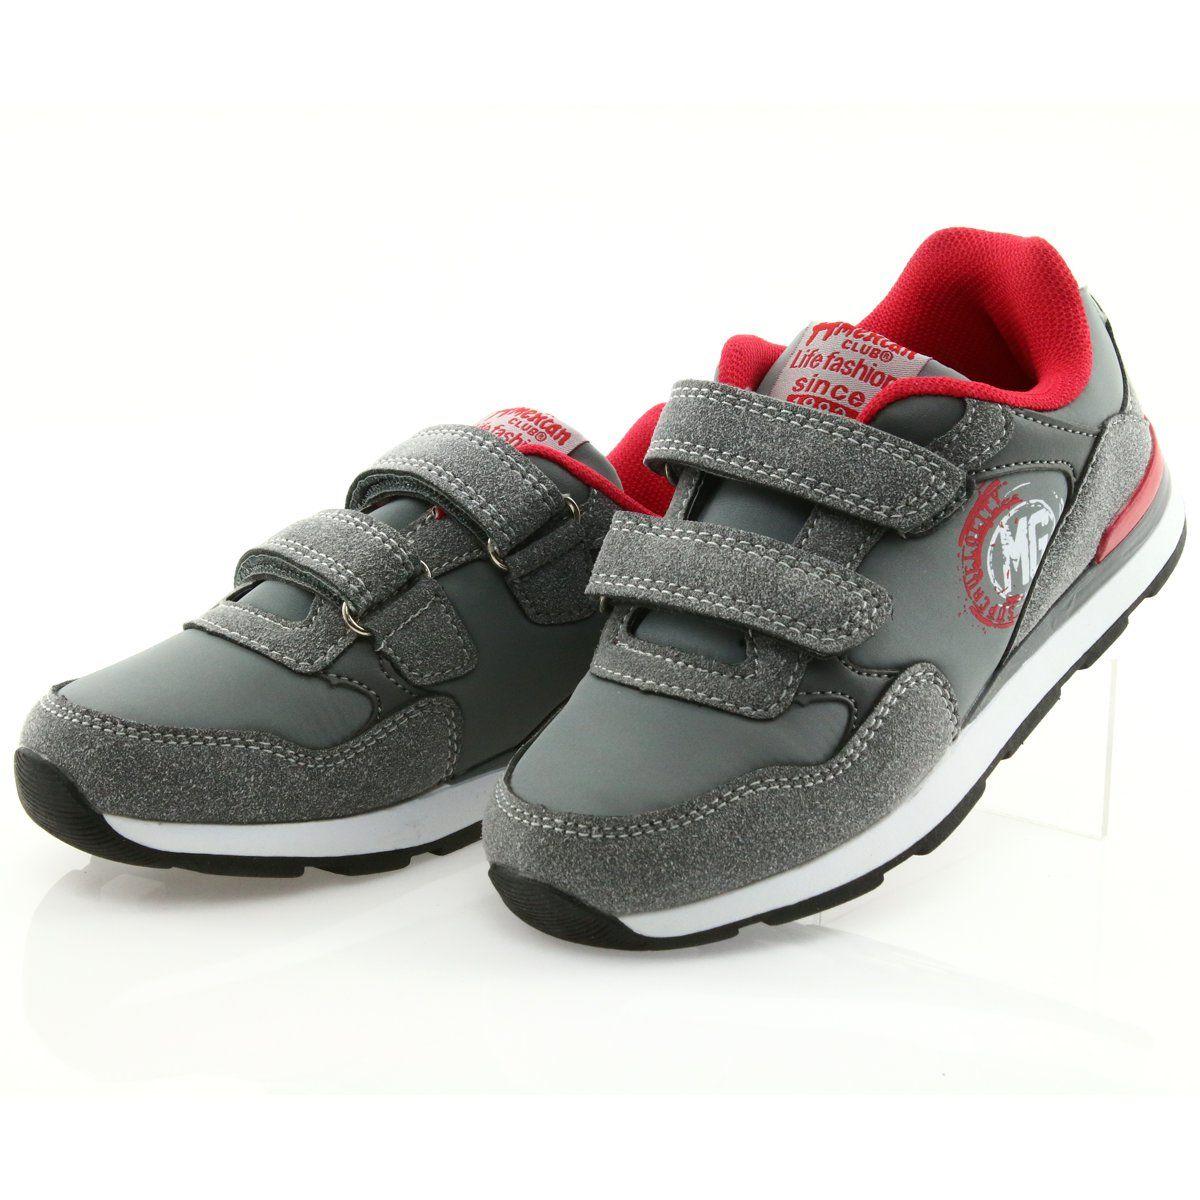 American Club Buty Sportowe Wkladka Skorzana American Bs08 Szare Czerwone Sport Shoes Kid Shoes Shoes